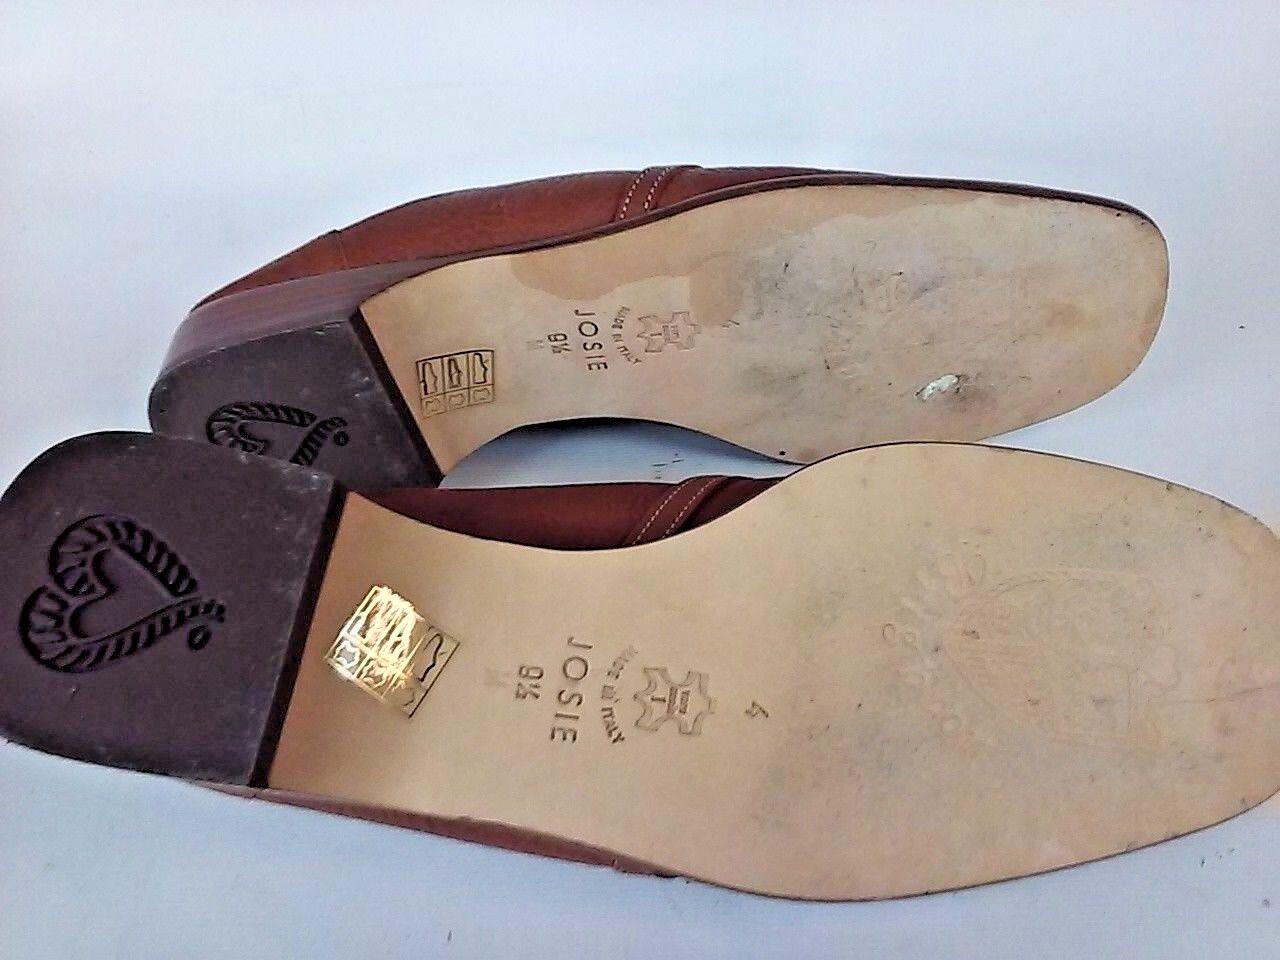 Brighton Damenschuhe Horsebit Braun Tan Leder Mule Loafer taly Schuhe 9.5 M Made taly Loafer 0c66f4